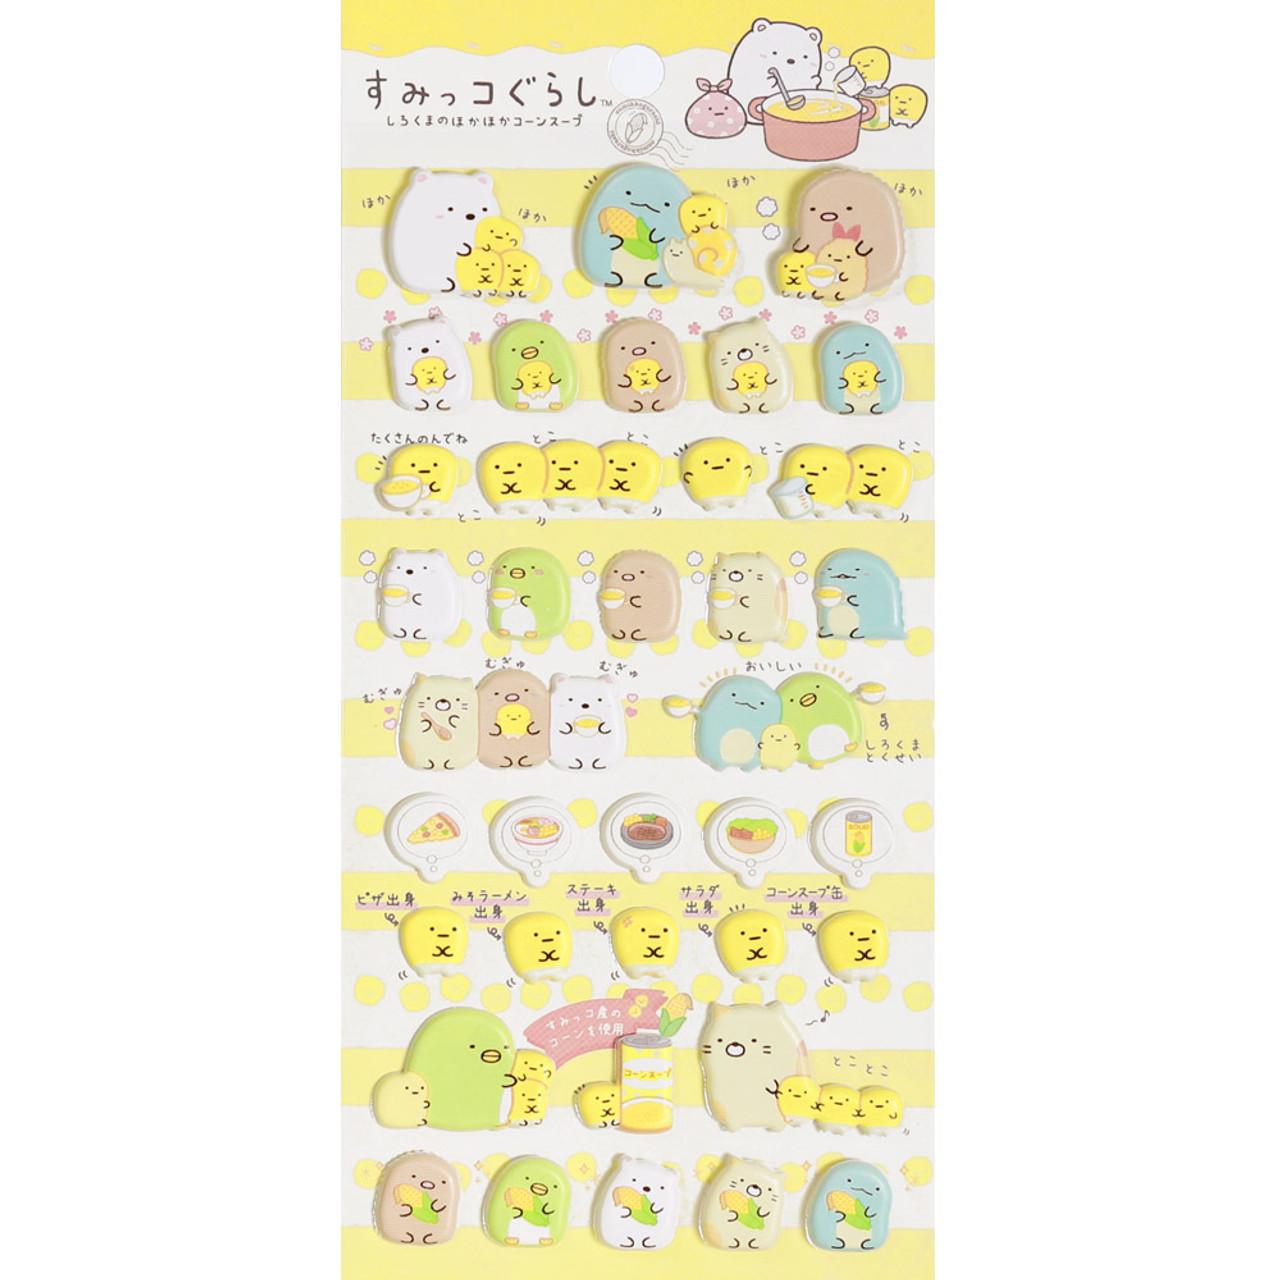 Sumikko Gurashi Funny Collection Sticker SE49201 - Corn ( Front View )